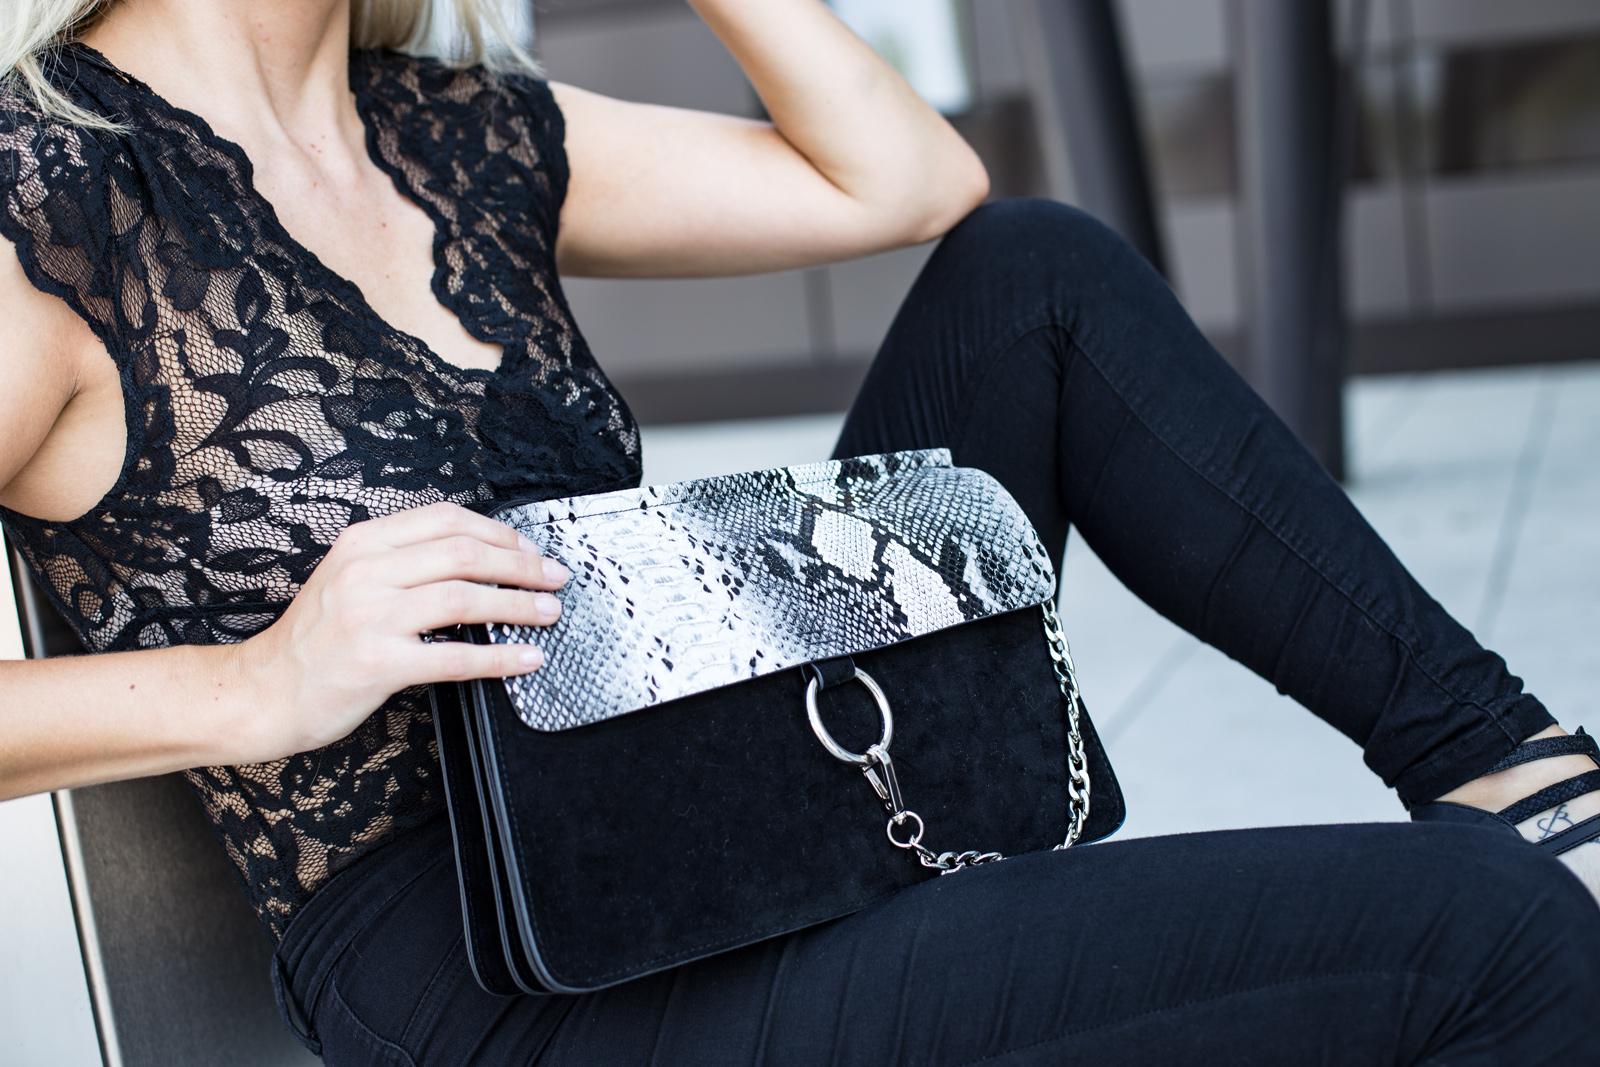 Foto_by_Nadja_Nemetz_Wien_Outfit_Fashion_Mode_Modeblogger_Blogger_4